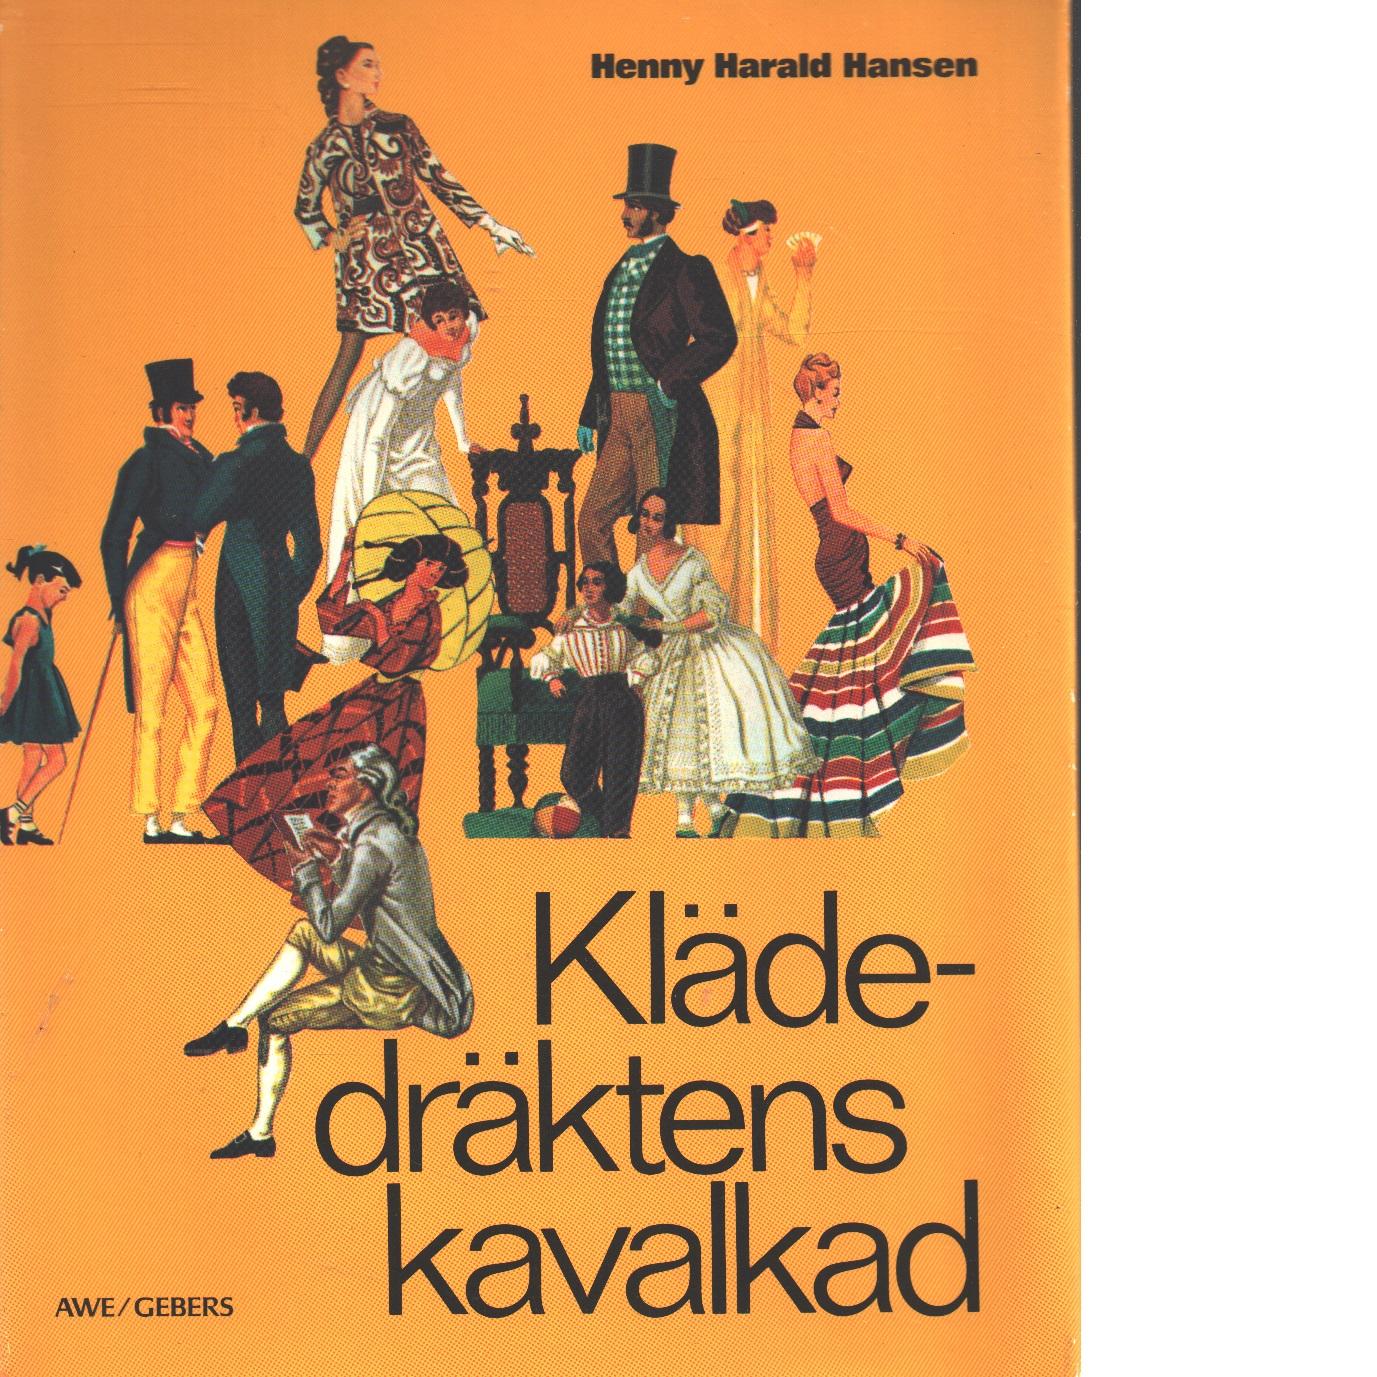 Klädedräktens kavalkad - Hansen, Henny Harald